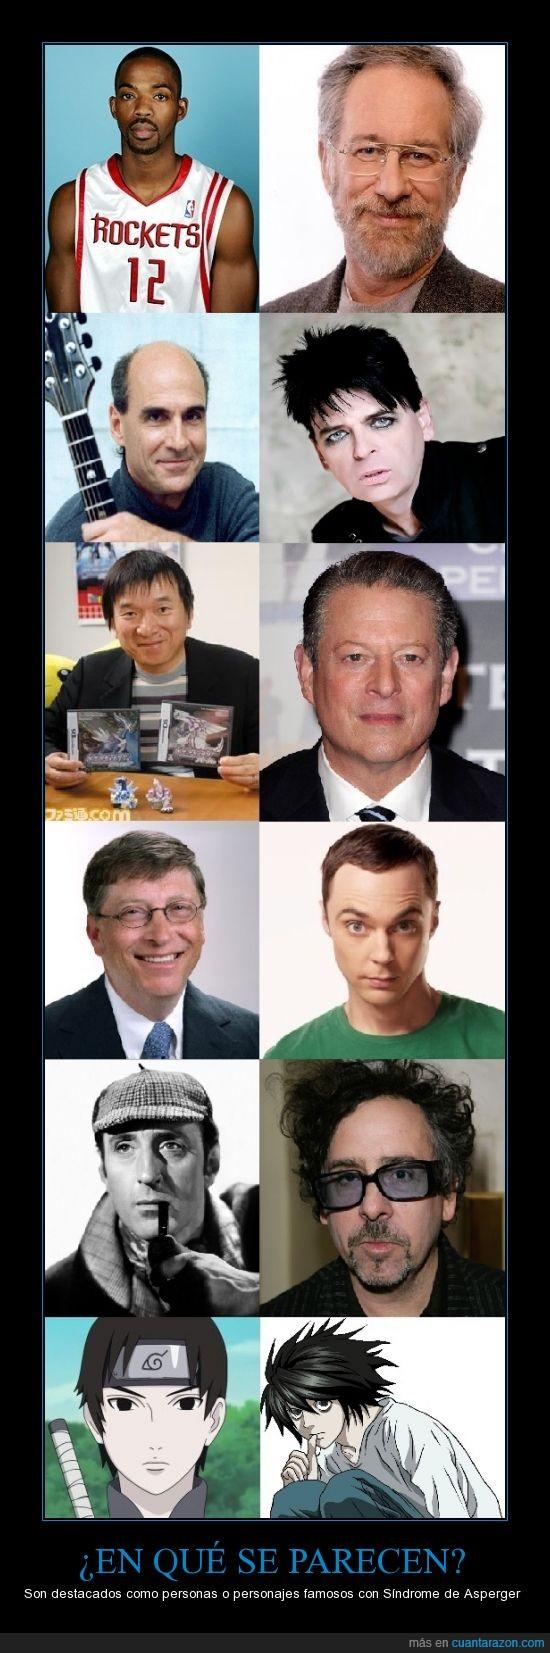 Al Gore,Bill Gates,famosos,Gary Numan,James Taylor,L,Rafer Alston,Sai,Satoshi Tajiri,Sheldon Cooper,Sherlock Holmes,Sindrome de Asperger,Steven Spielberg,Tim Burton